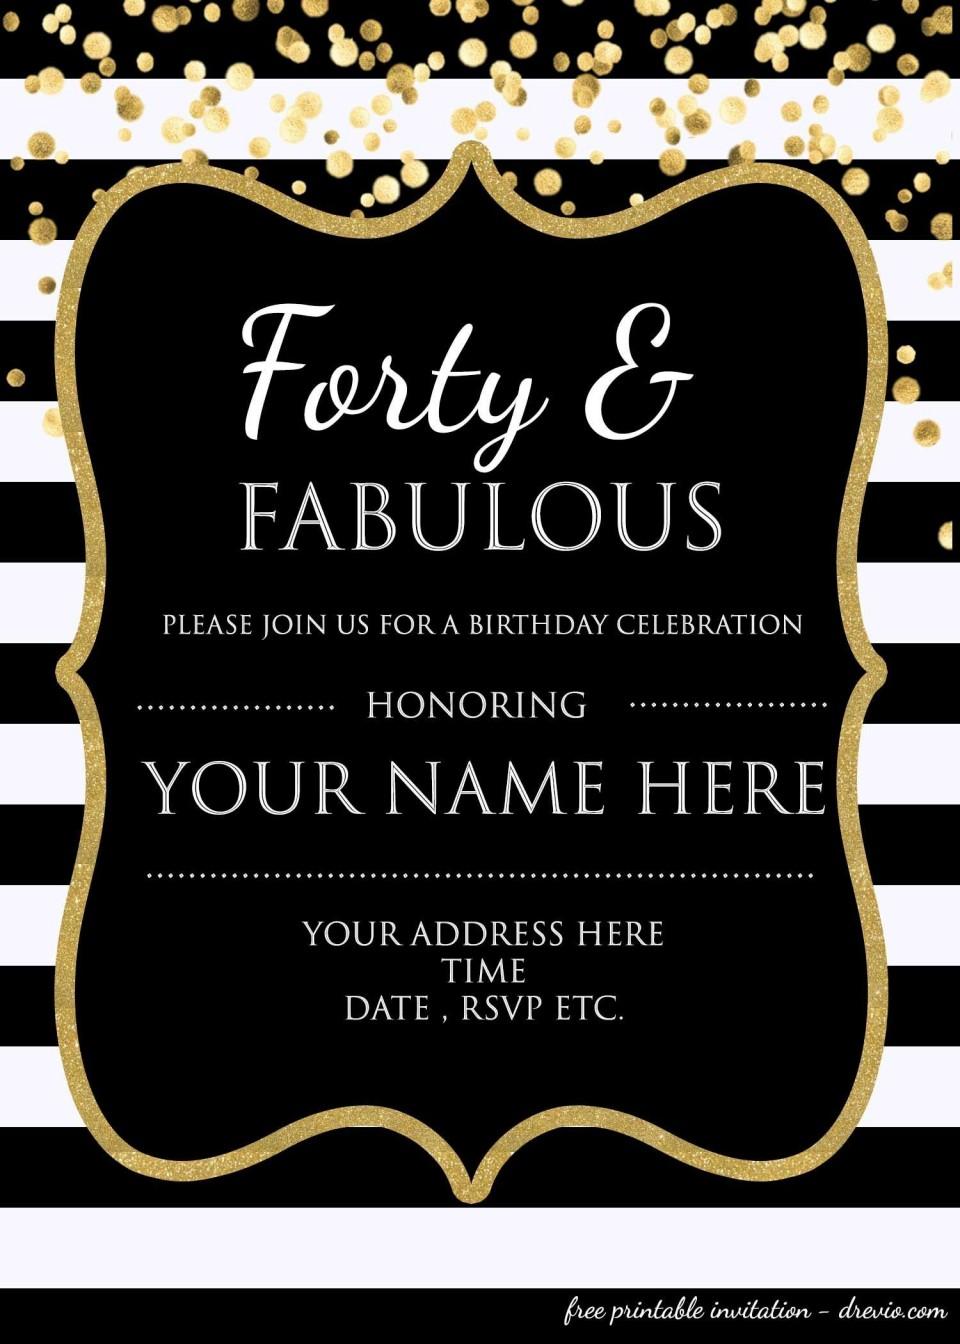 007 Impressive 40th Birthday Party Invite Template Free Inspiration 960